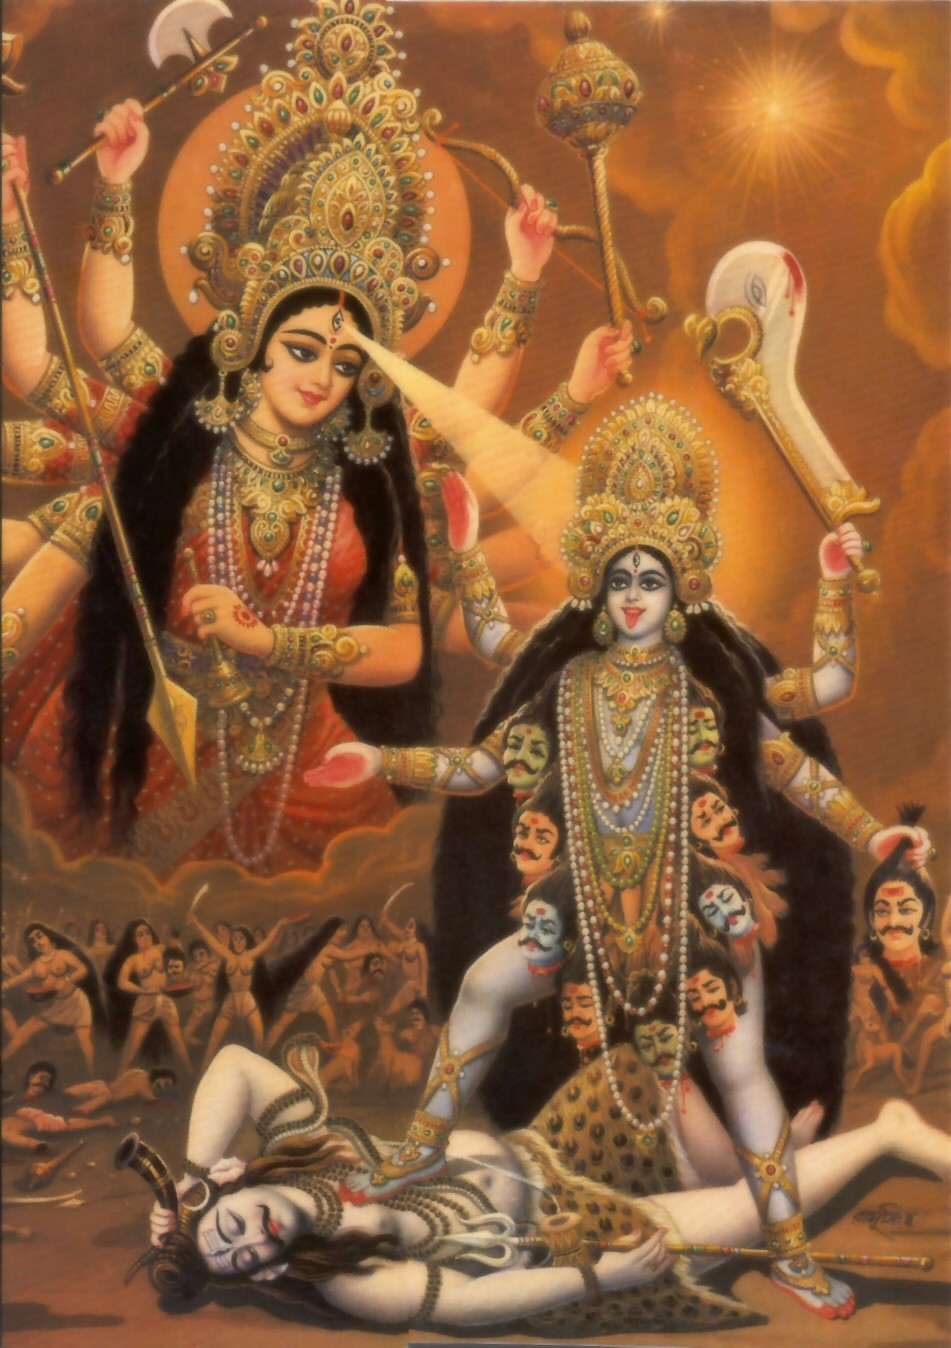 BHAKTI SONGS AND WALLPAPER: Lord Kali Ma Photos